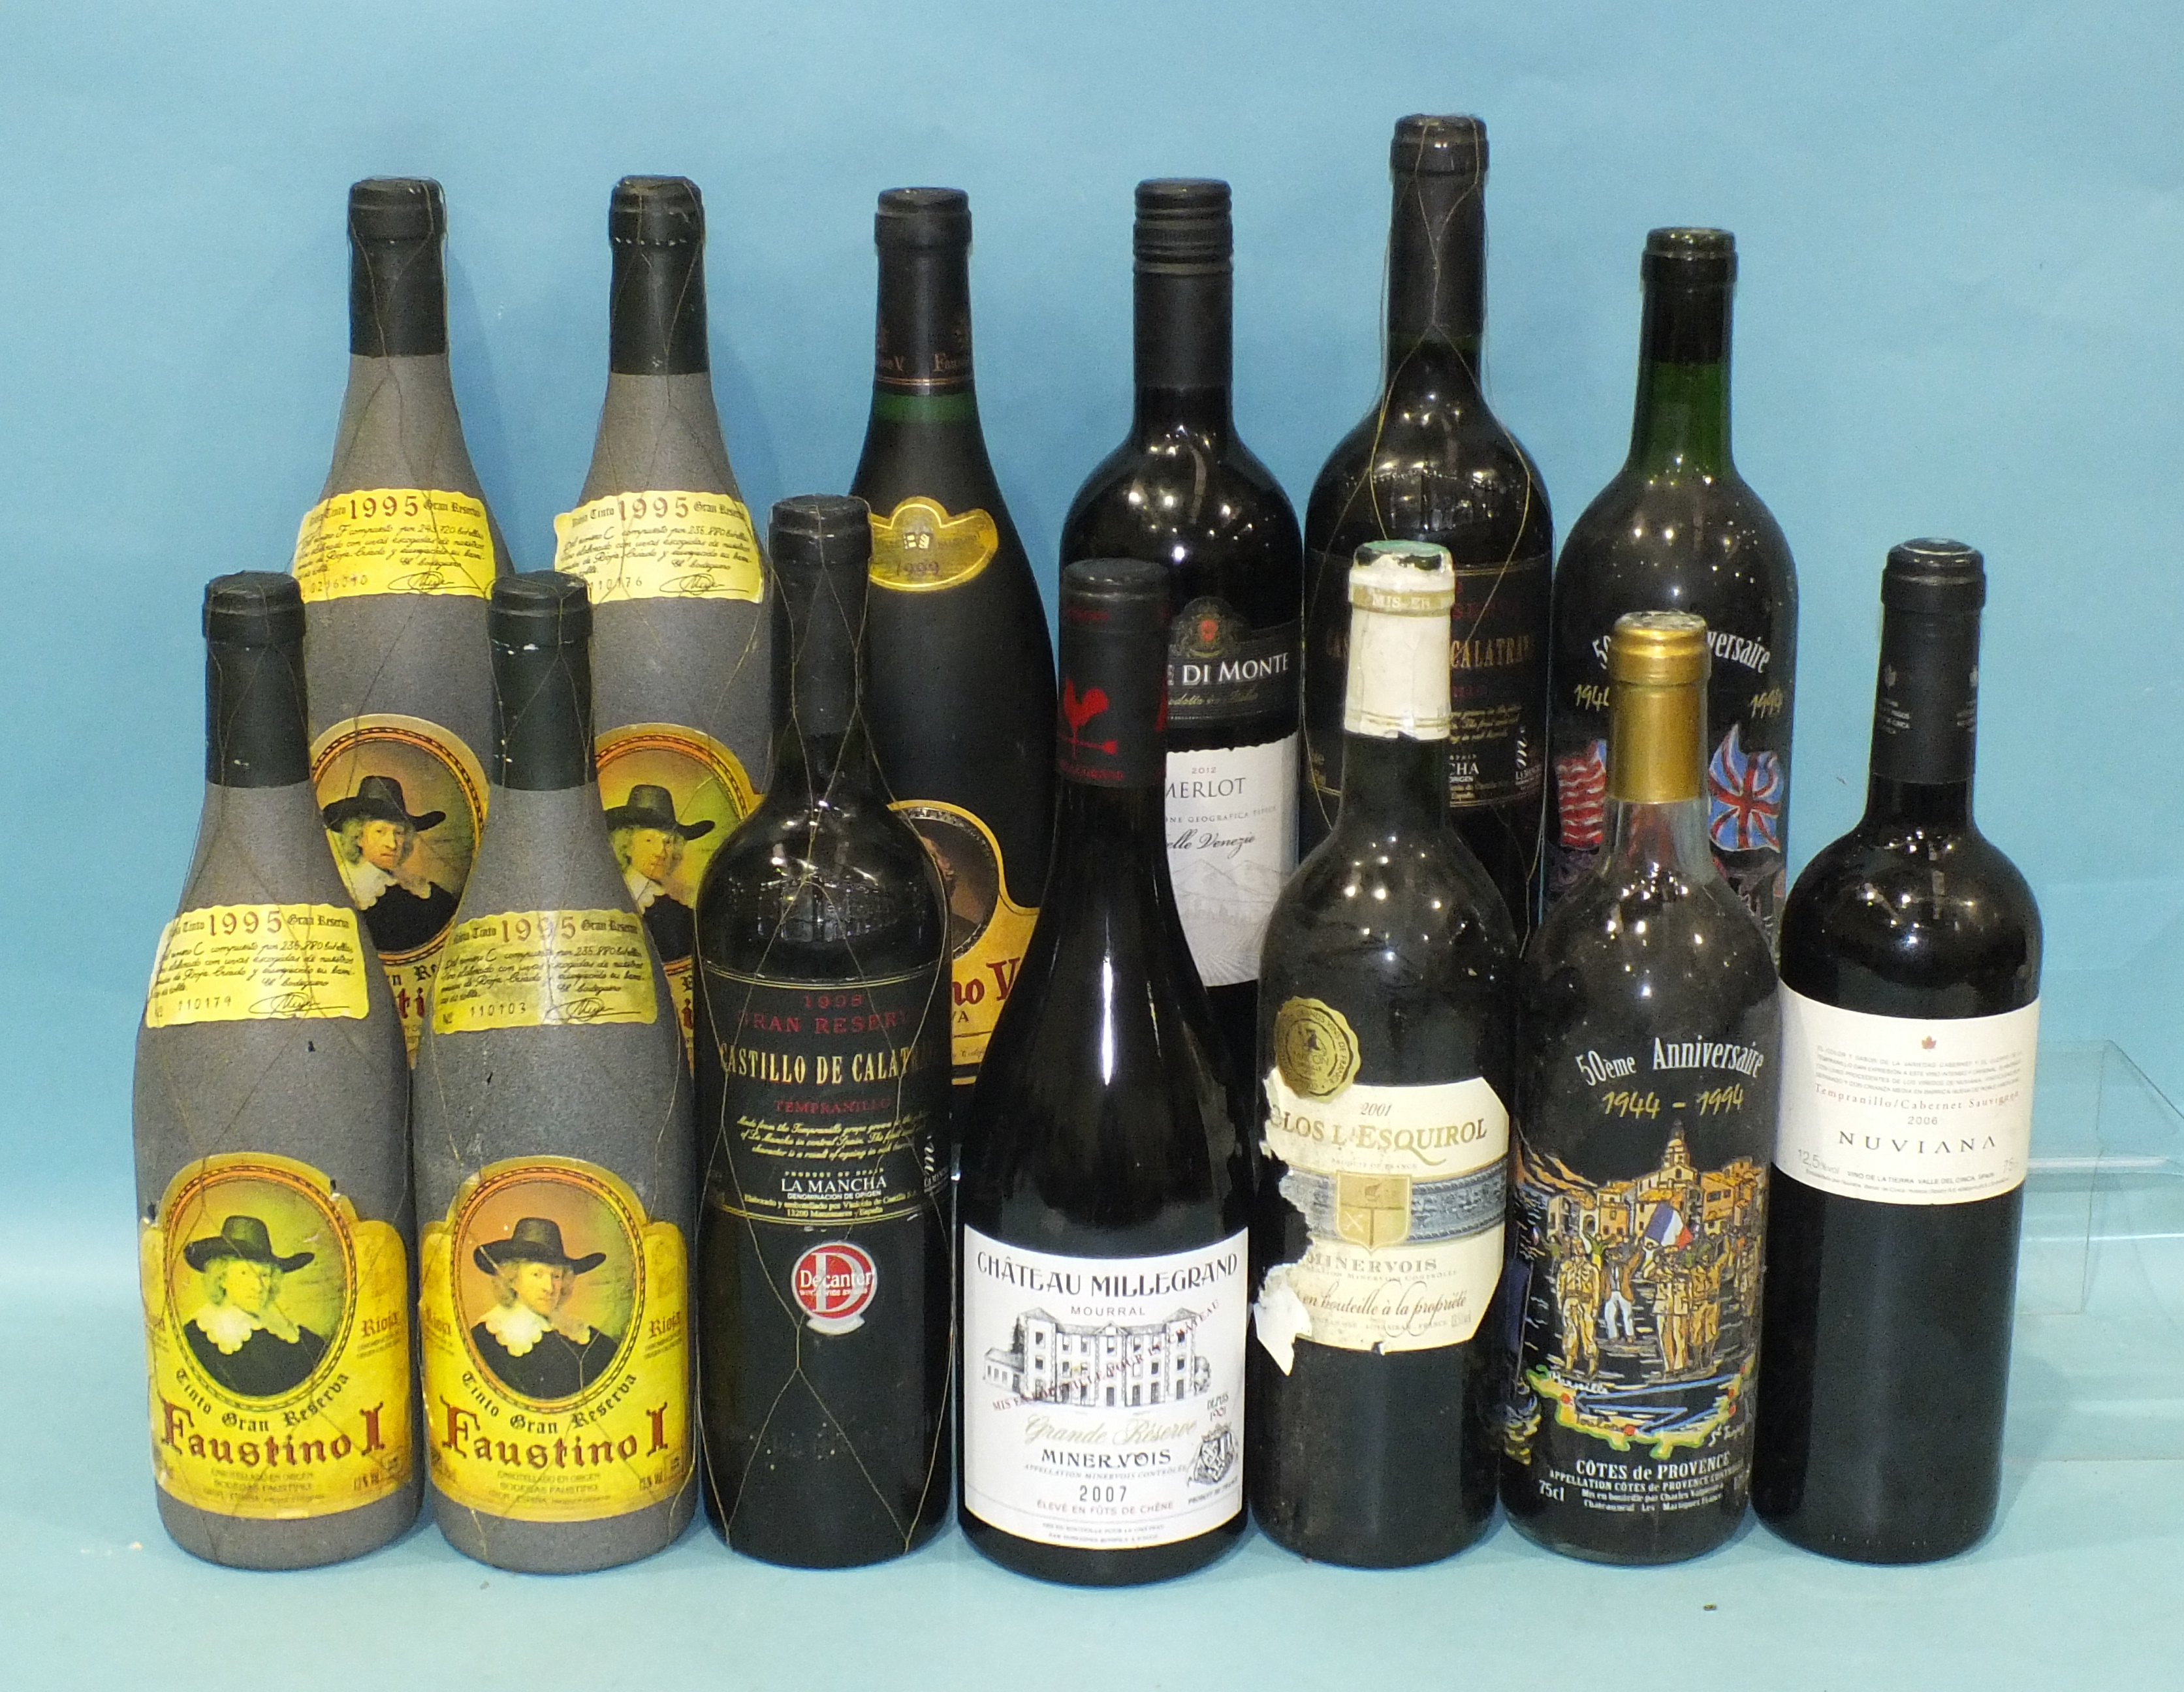 Faustino Rioja Tinto 1995 Grand Reserva, four bottles, Castillo De Calatrava Gran Reserva